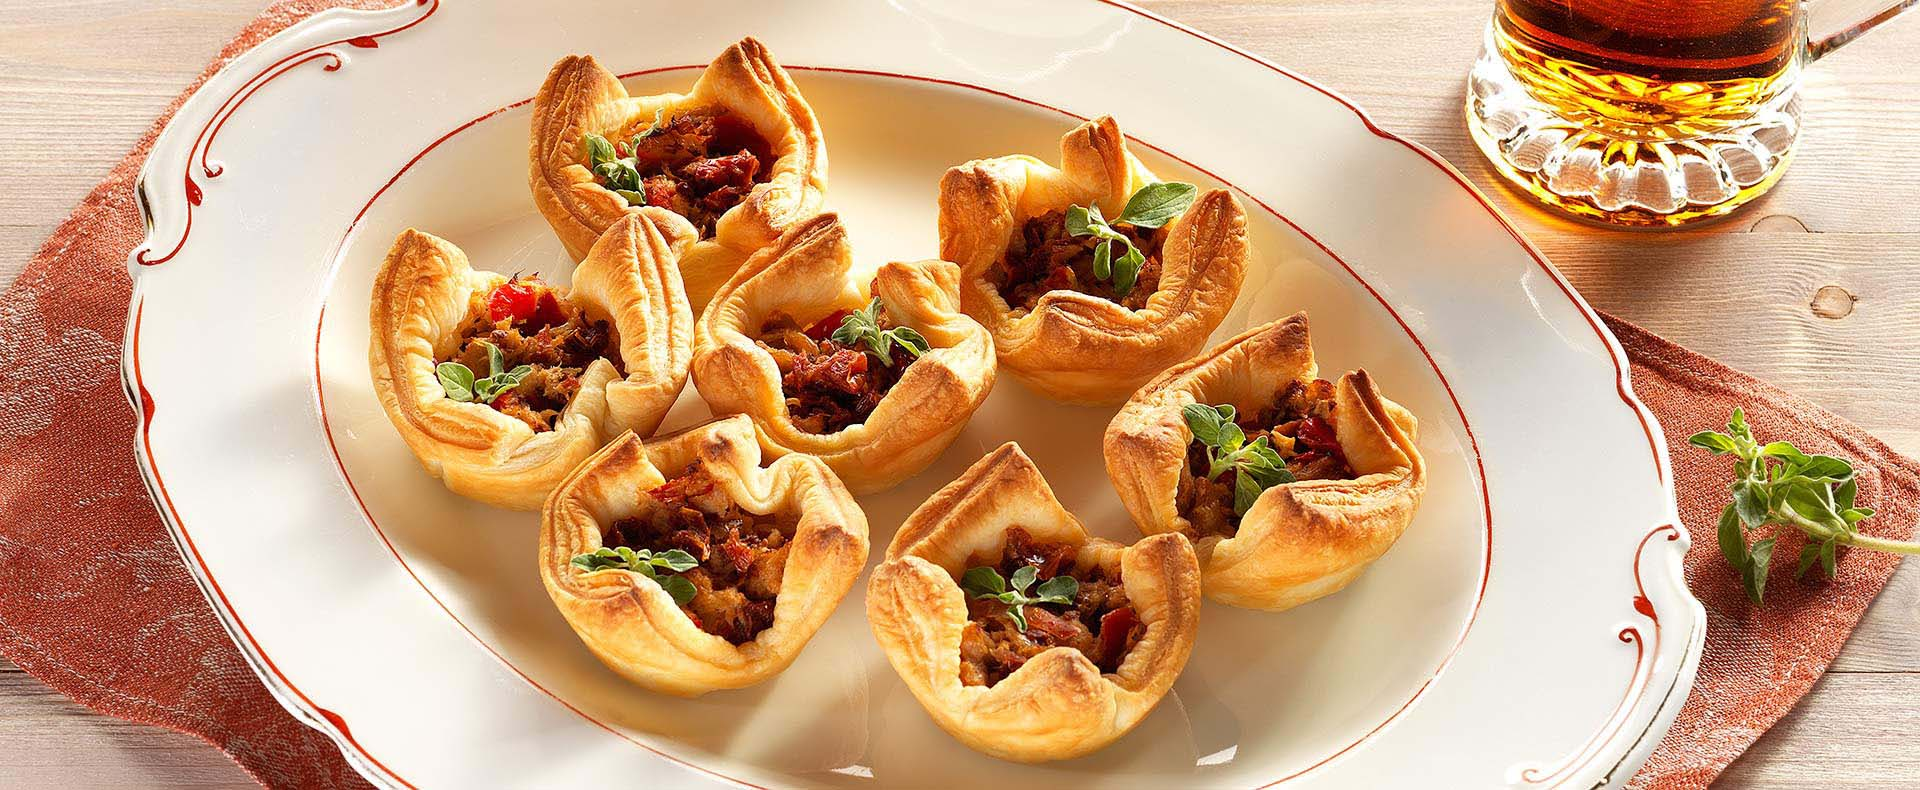 Tonhalas muffinok